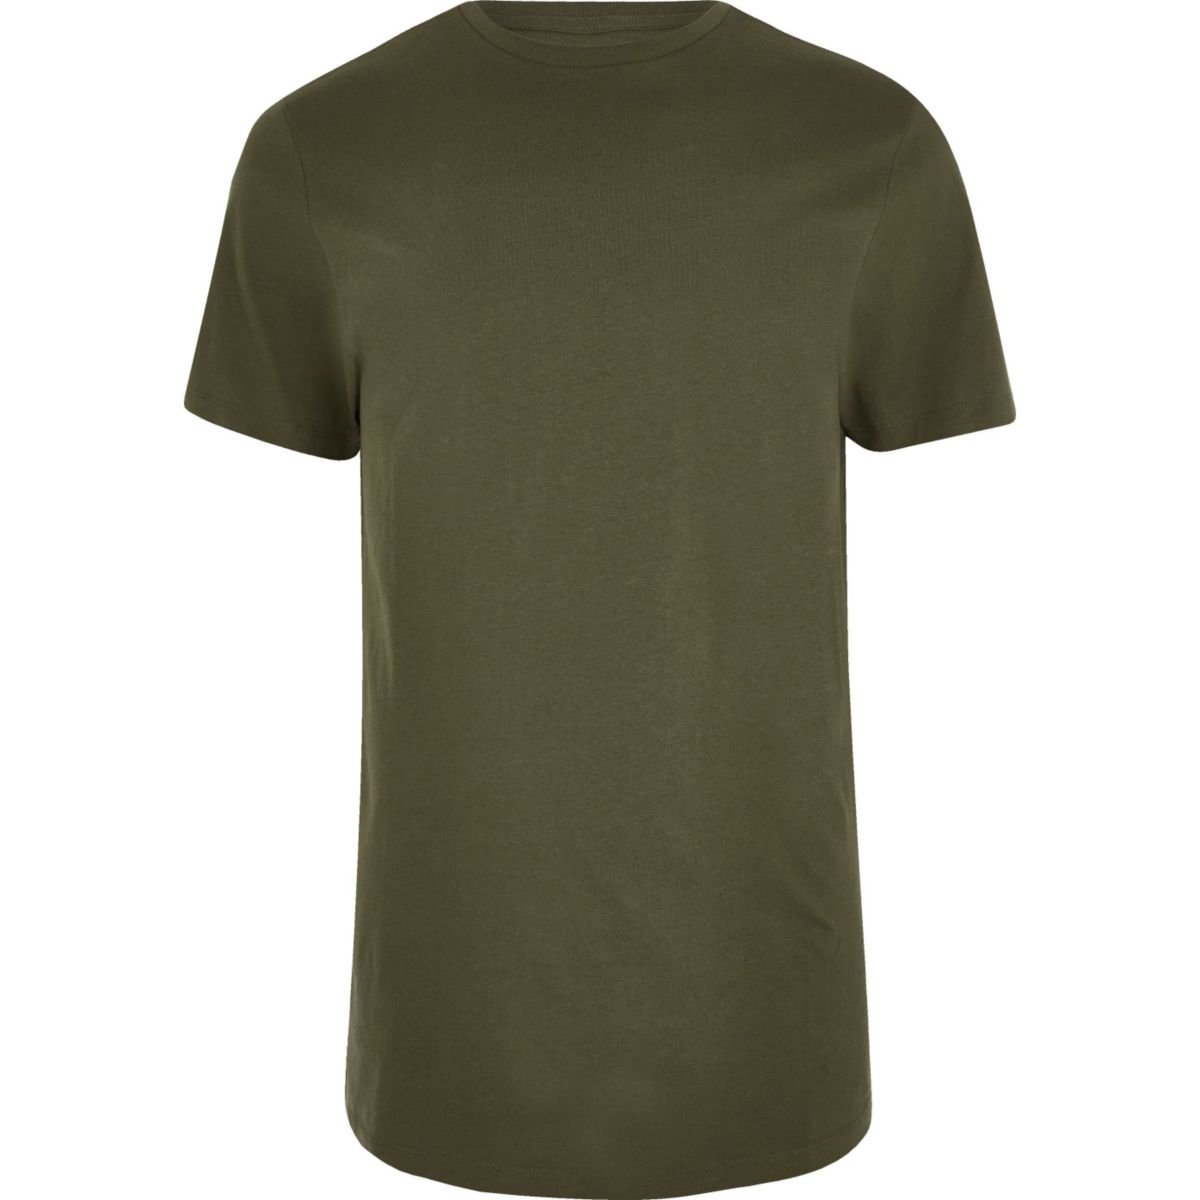 Dark green curved hem longline T-shirt